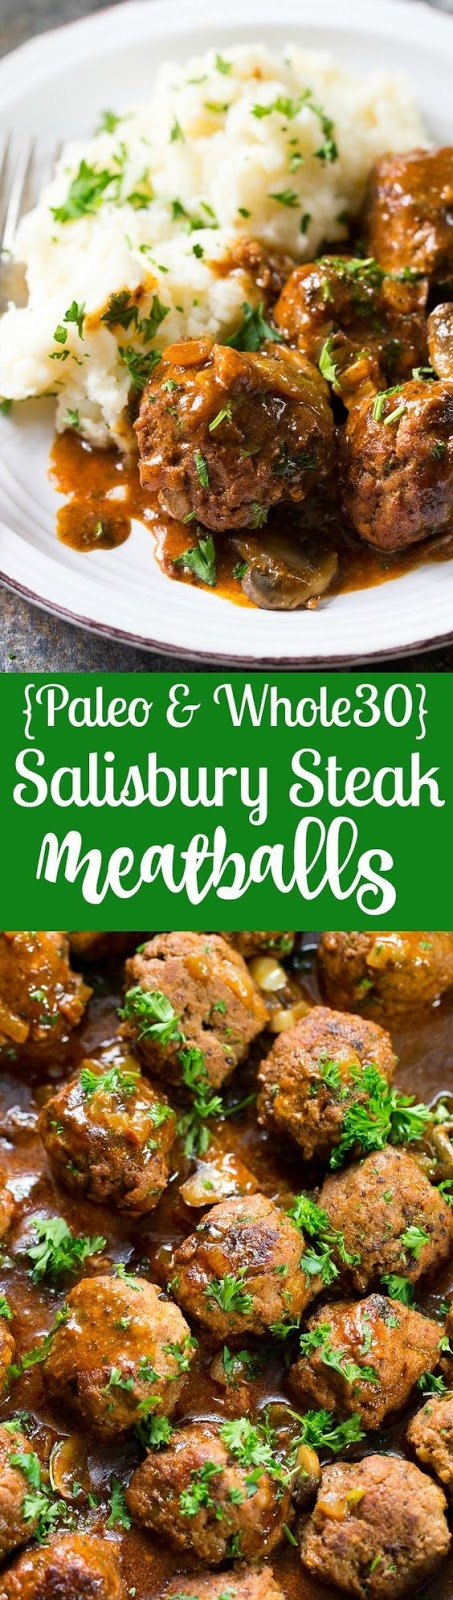 Salisbury Steak Meatballs (Paleo & Whole30)